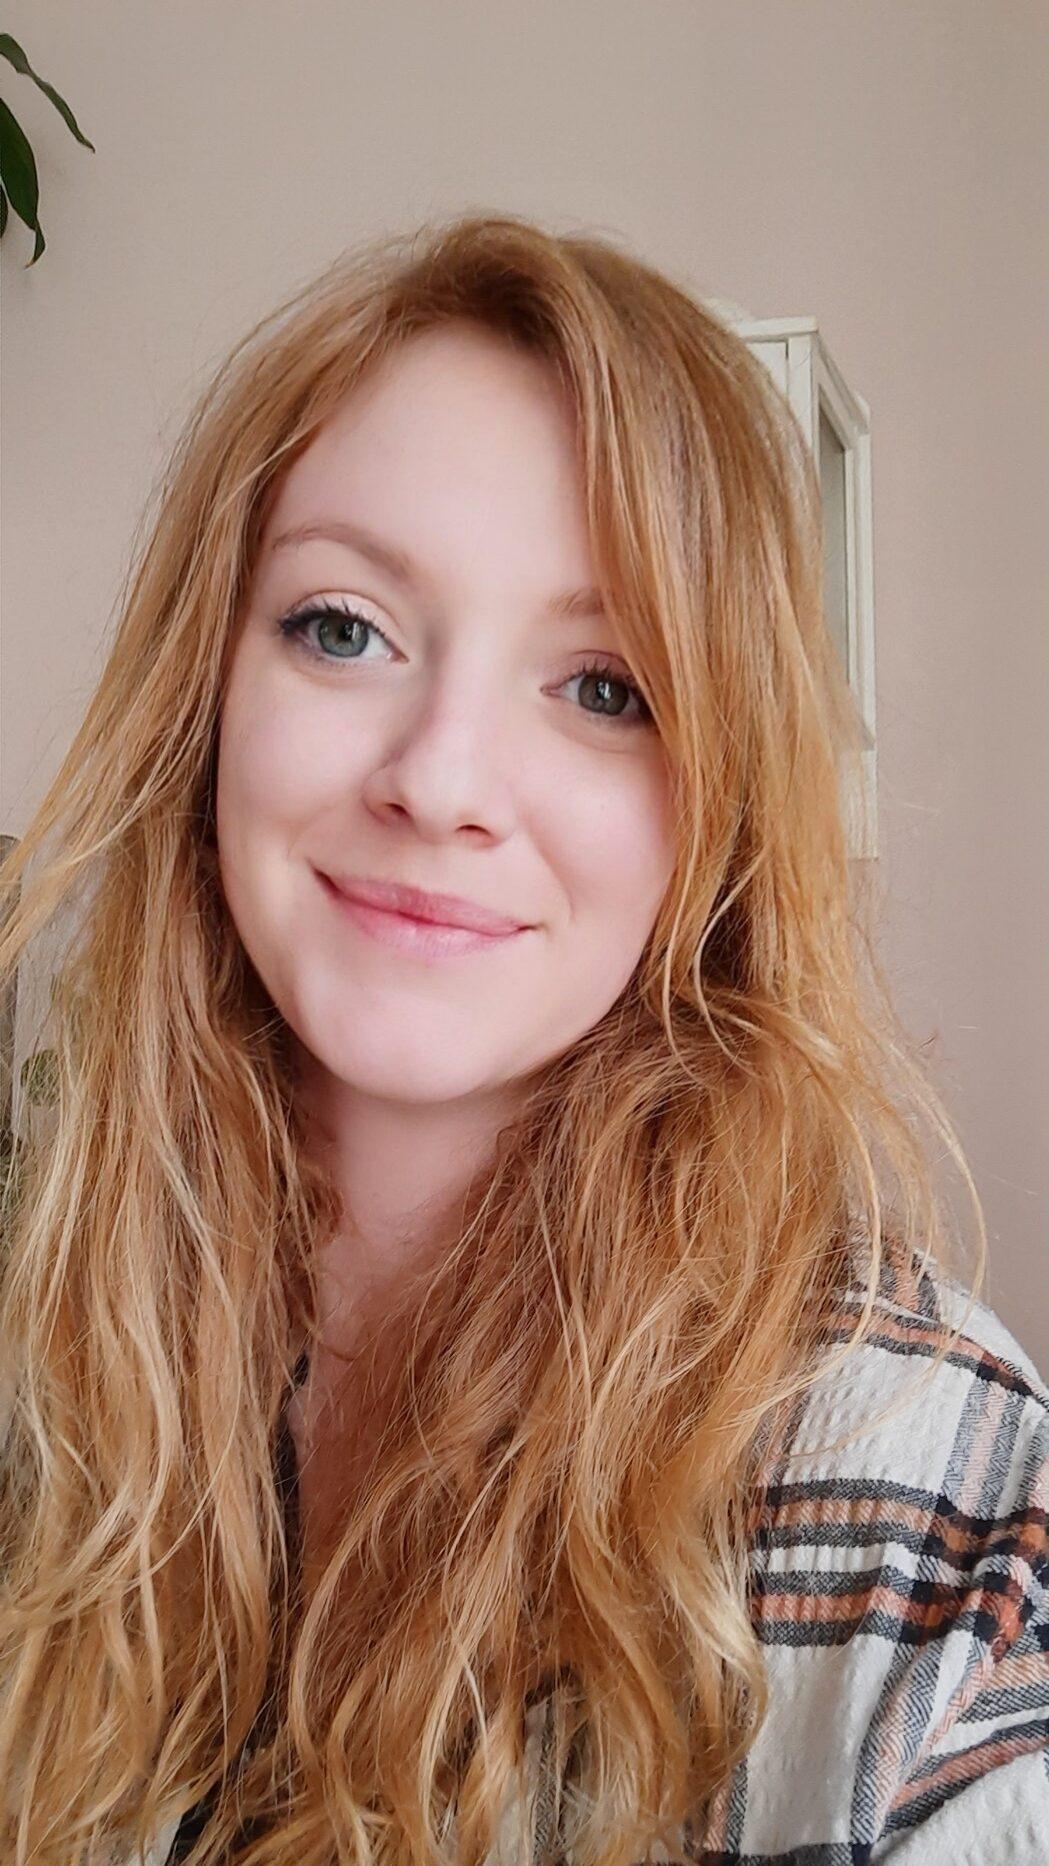 Sarah-Fee Ketelsen